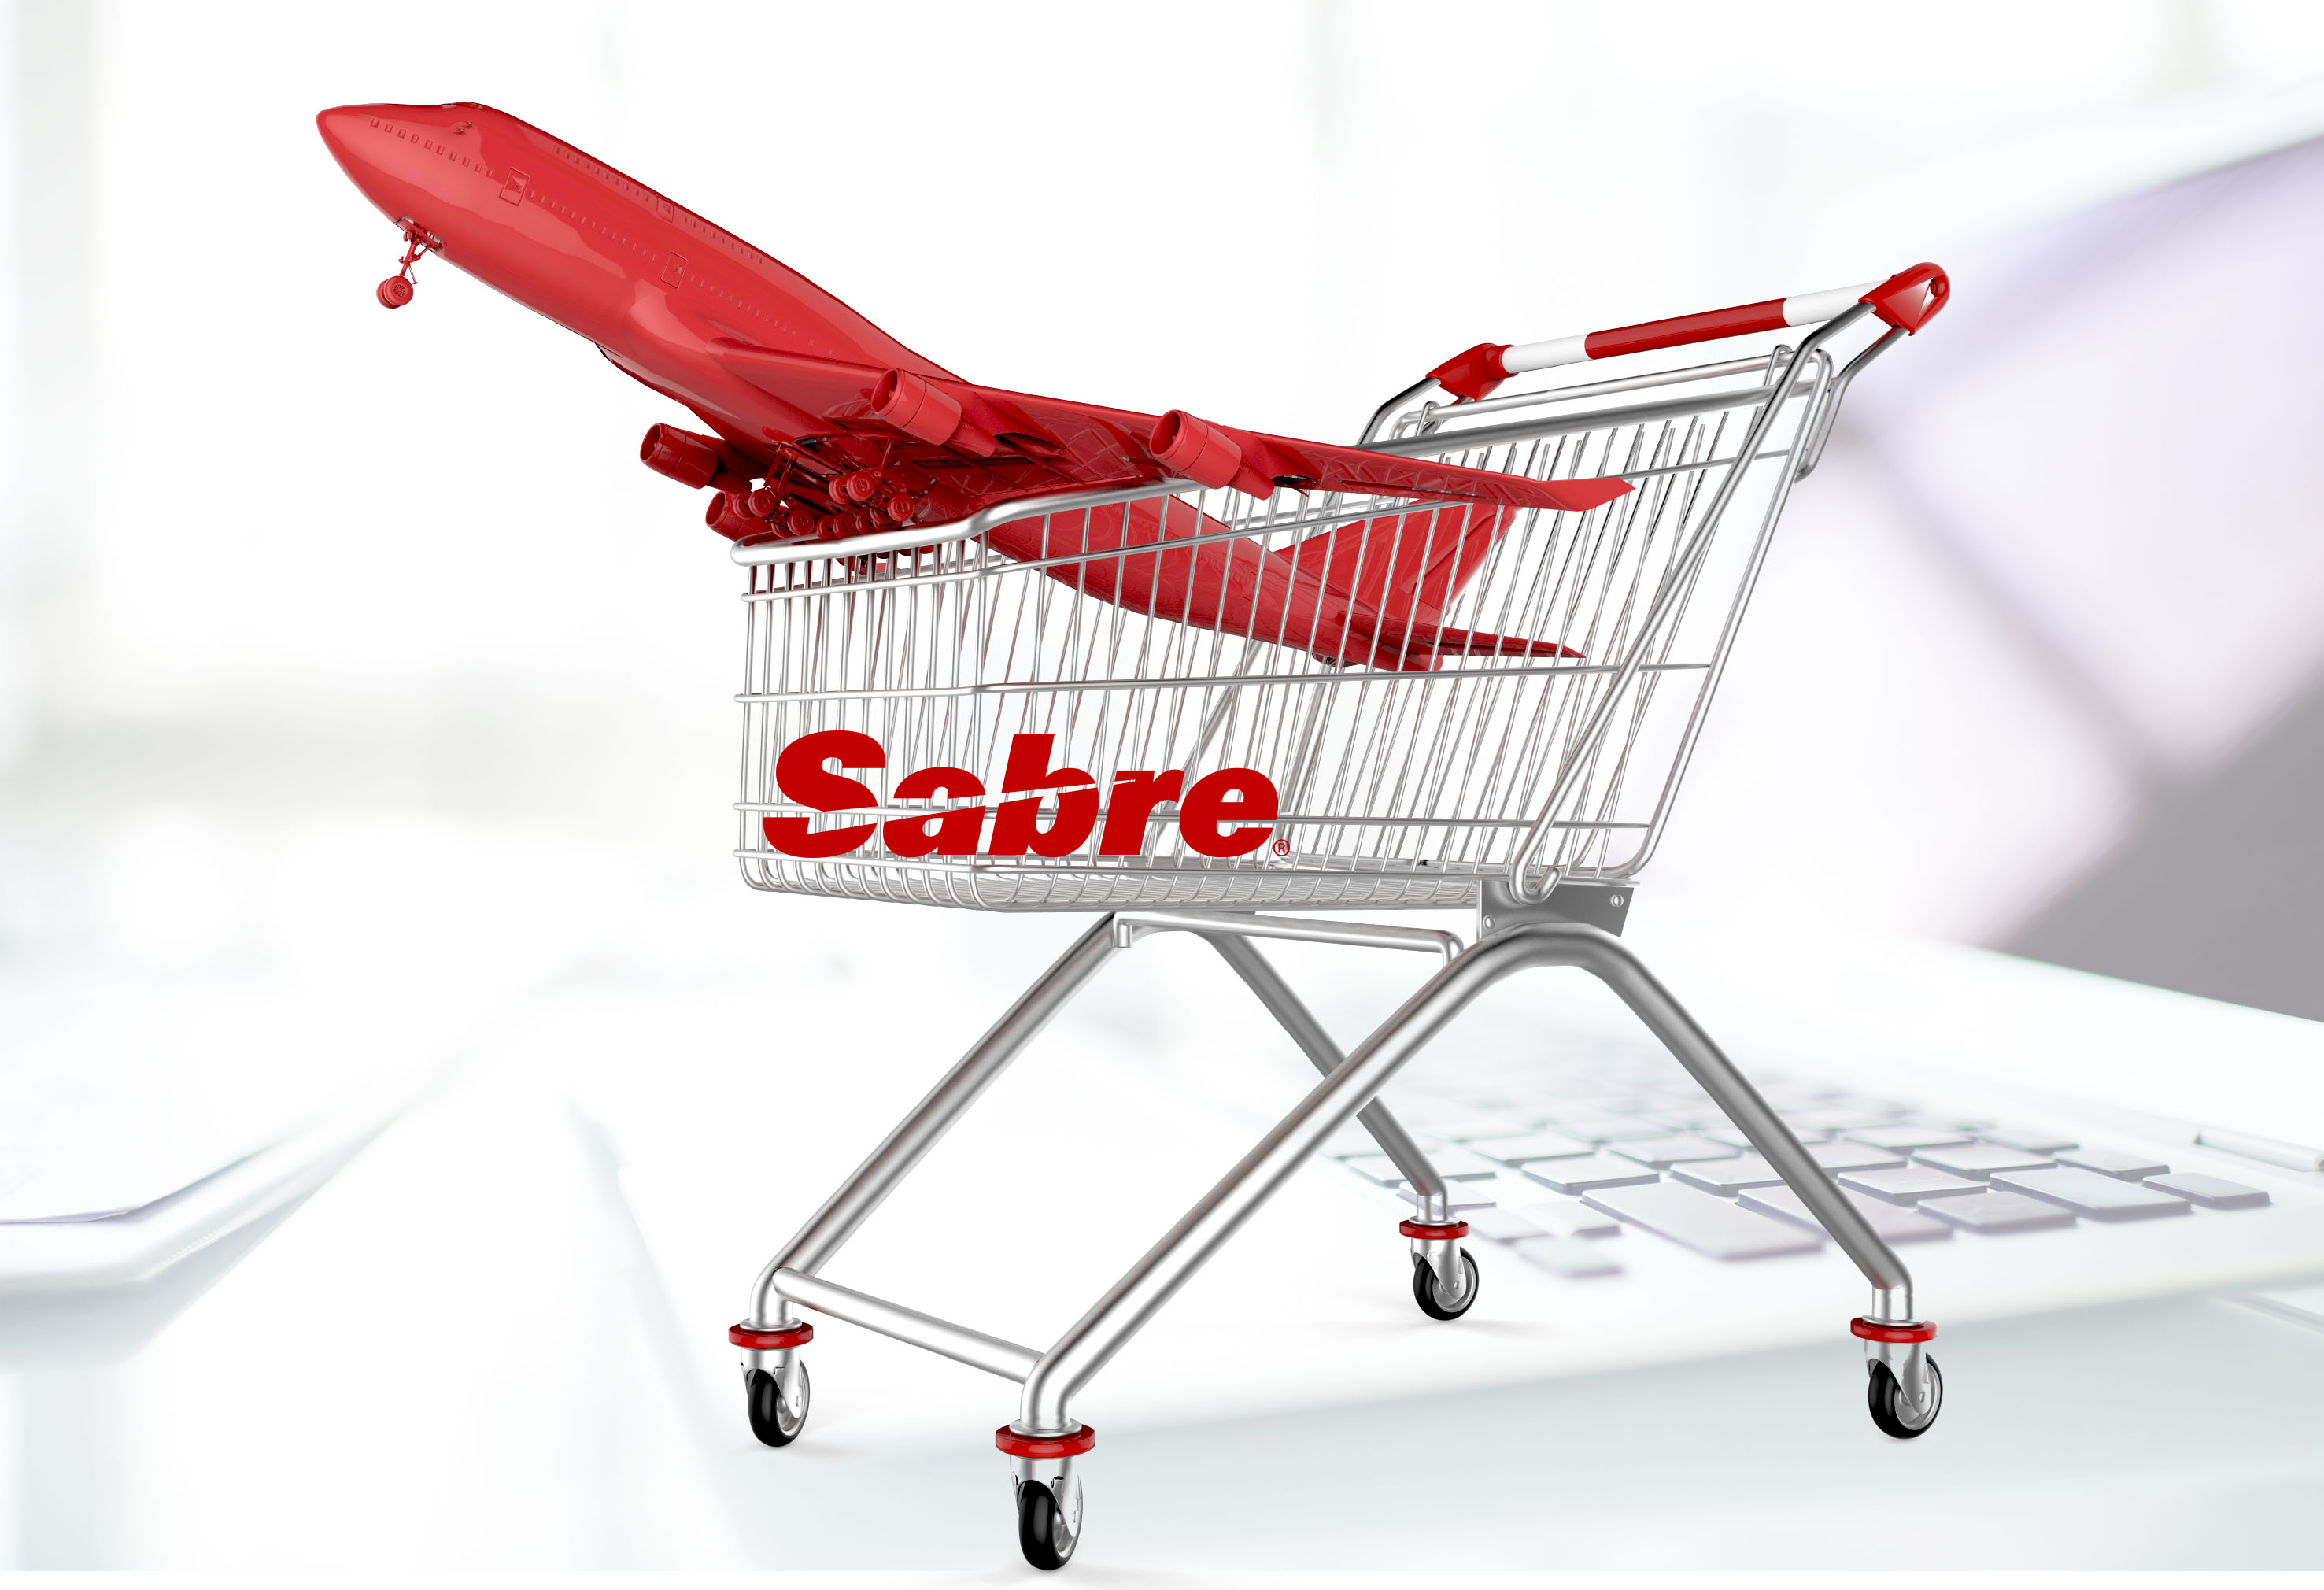 shop cart and aircraft